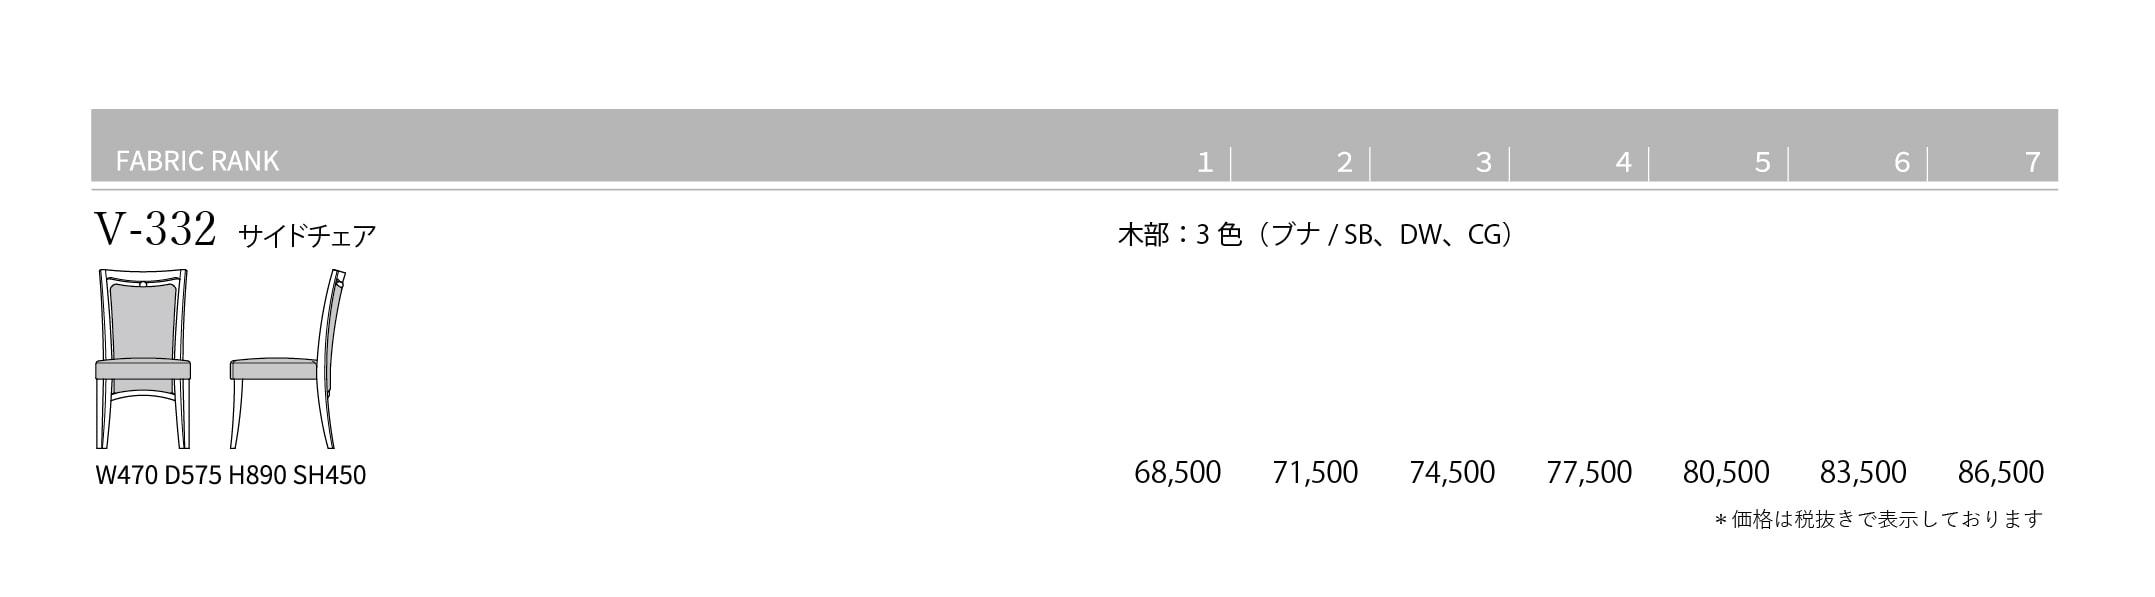 V-332 Price List